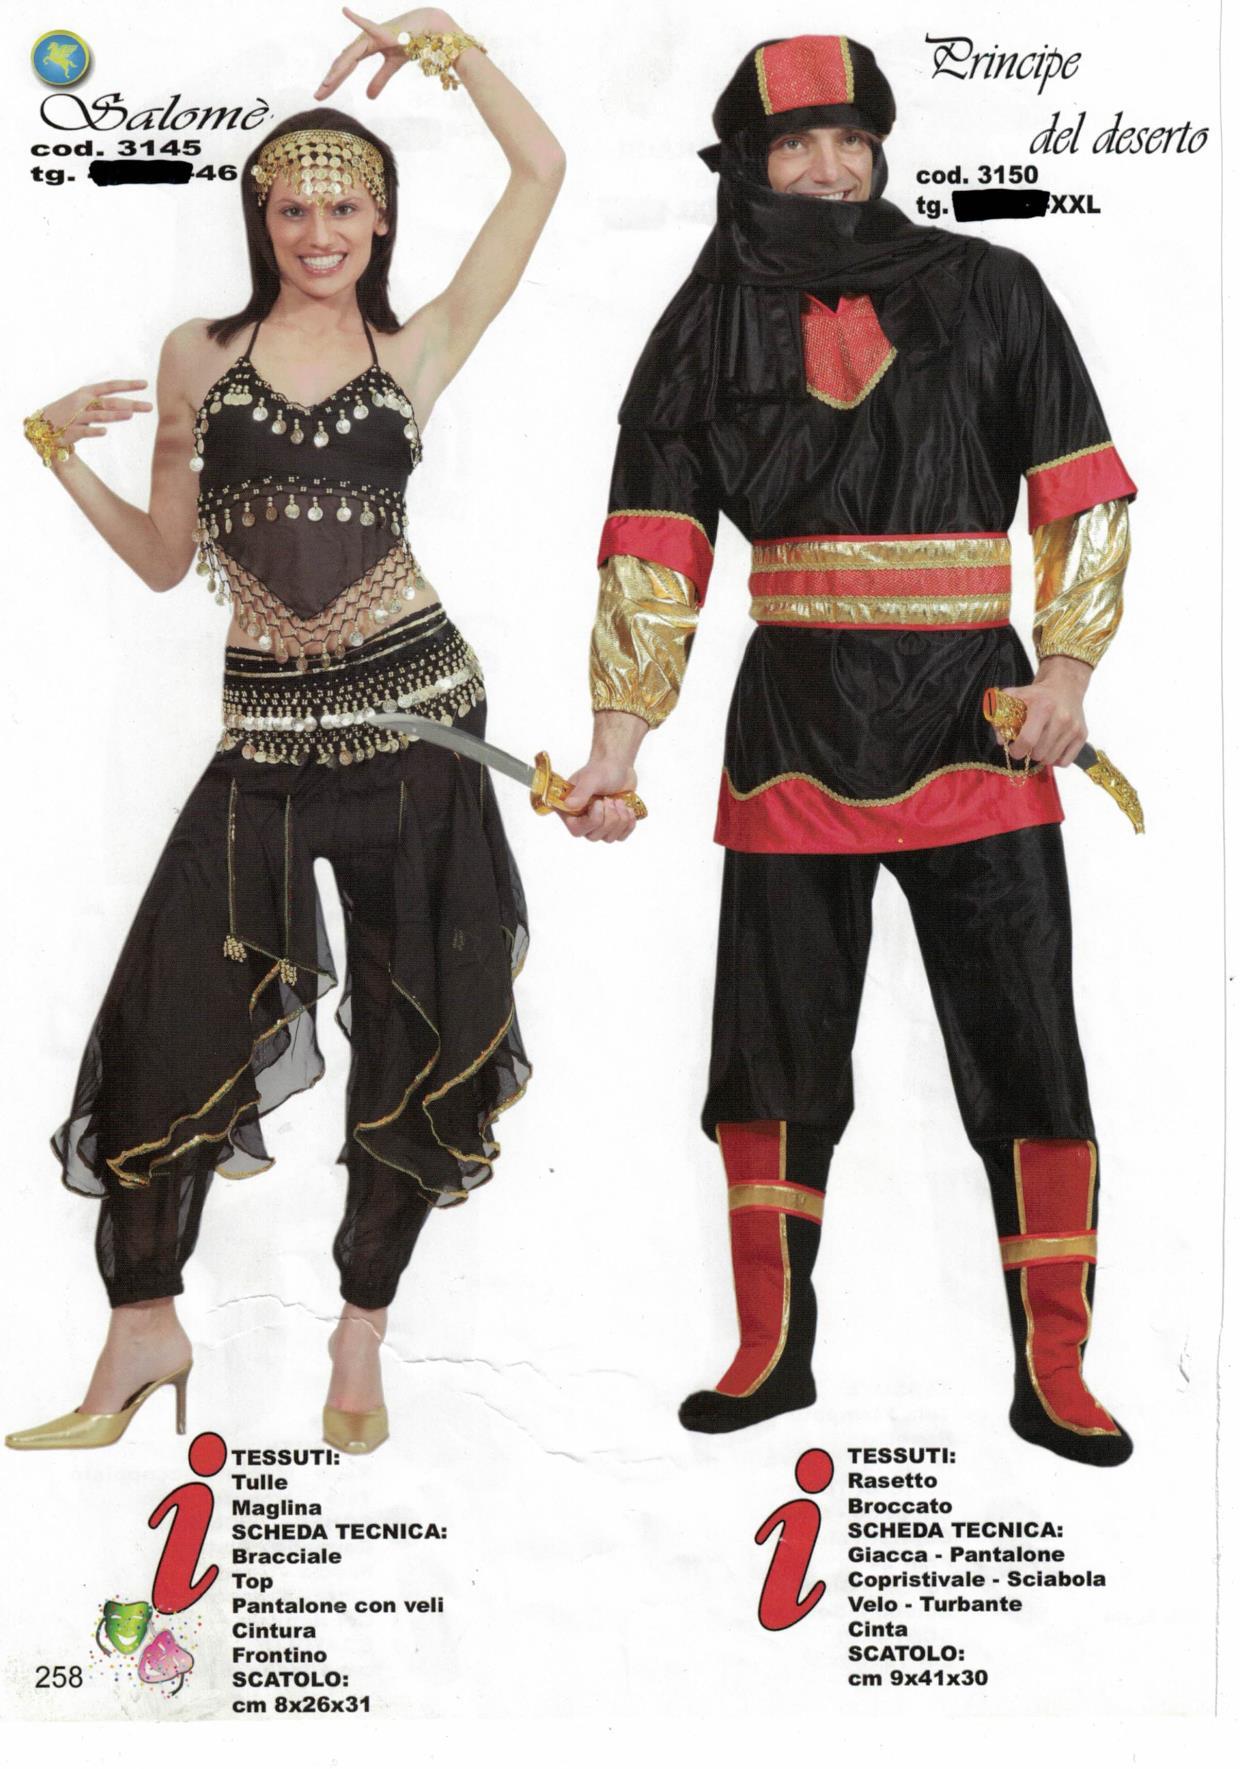 Noleggio vestiti da Orientali Adulti UD | Noleggio vestiti da Orientali Adulti PN | Noleggio vestiti da Orientali Adulti San Vito al Tagliamento